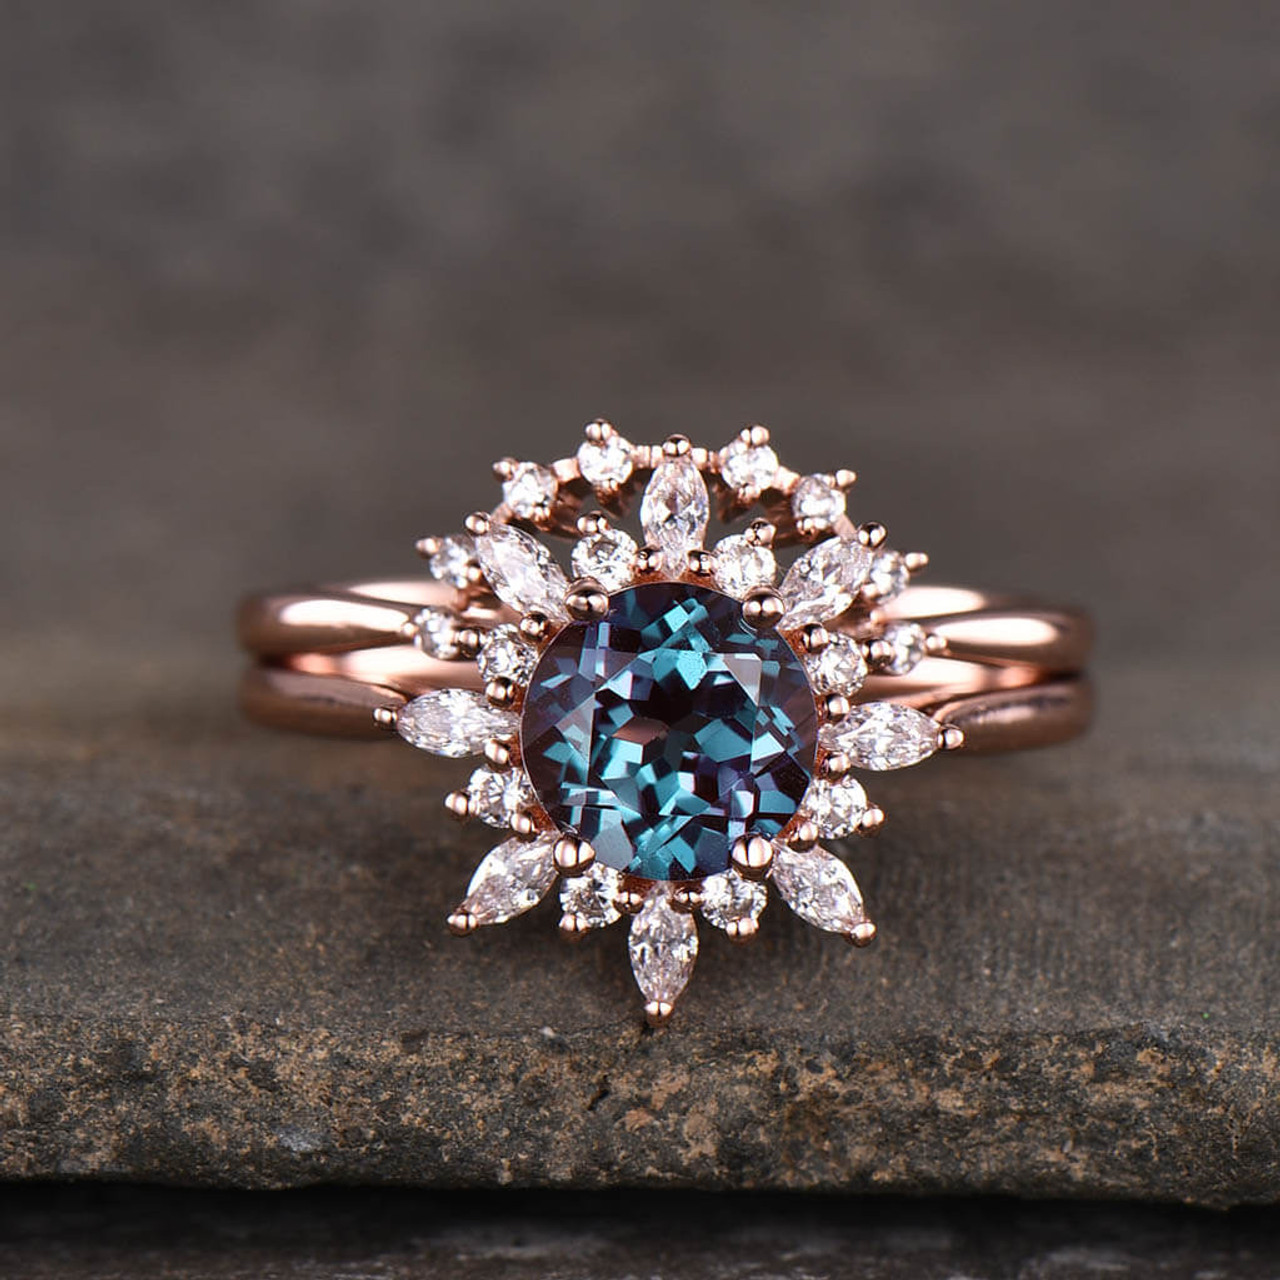 Floral Alexandrite Diamond/ Moissanite Engagement Ring Set 2pcs